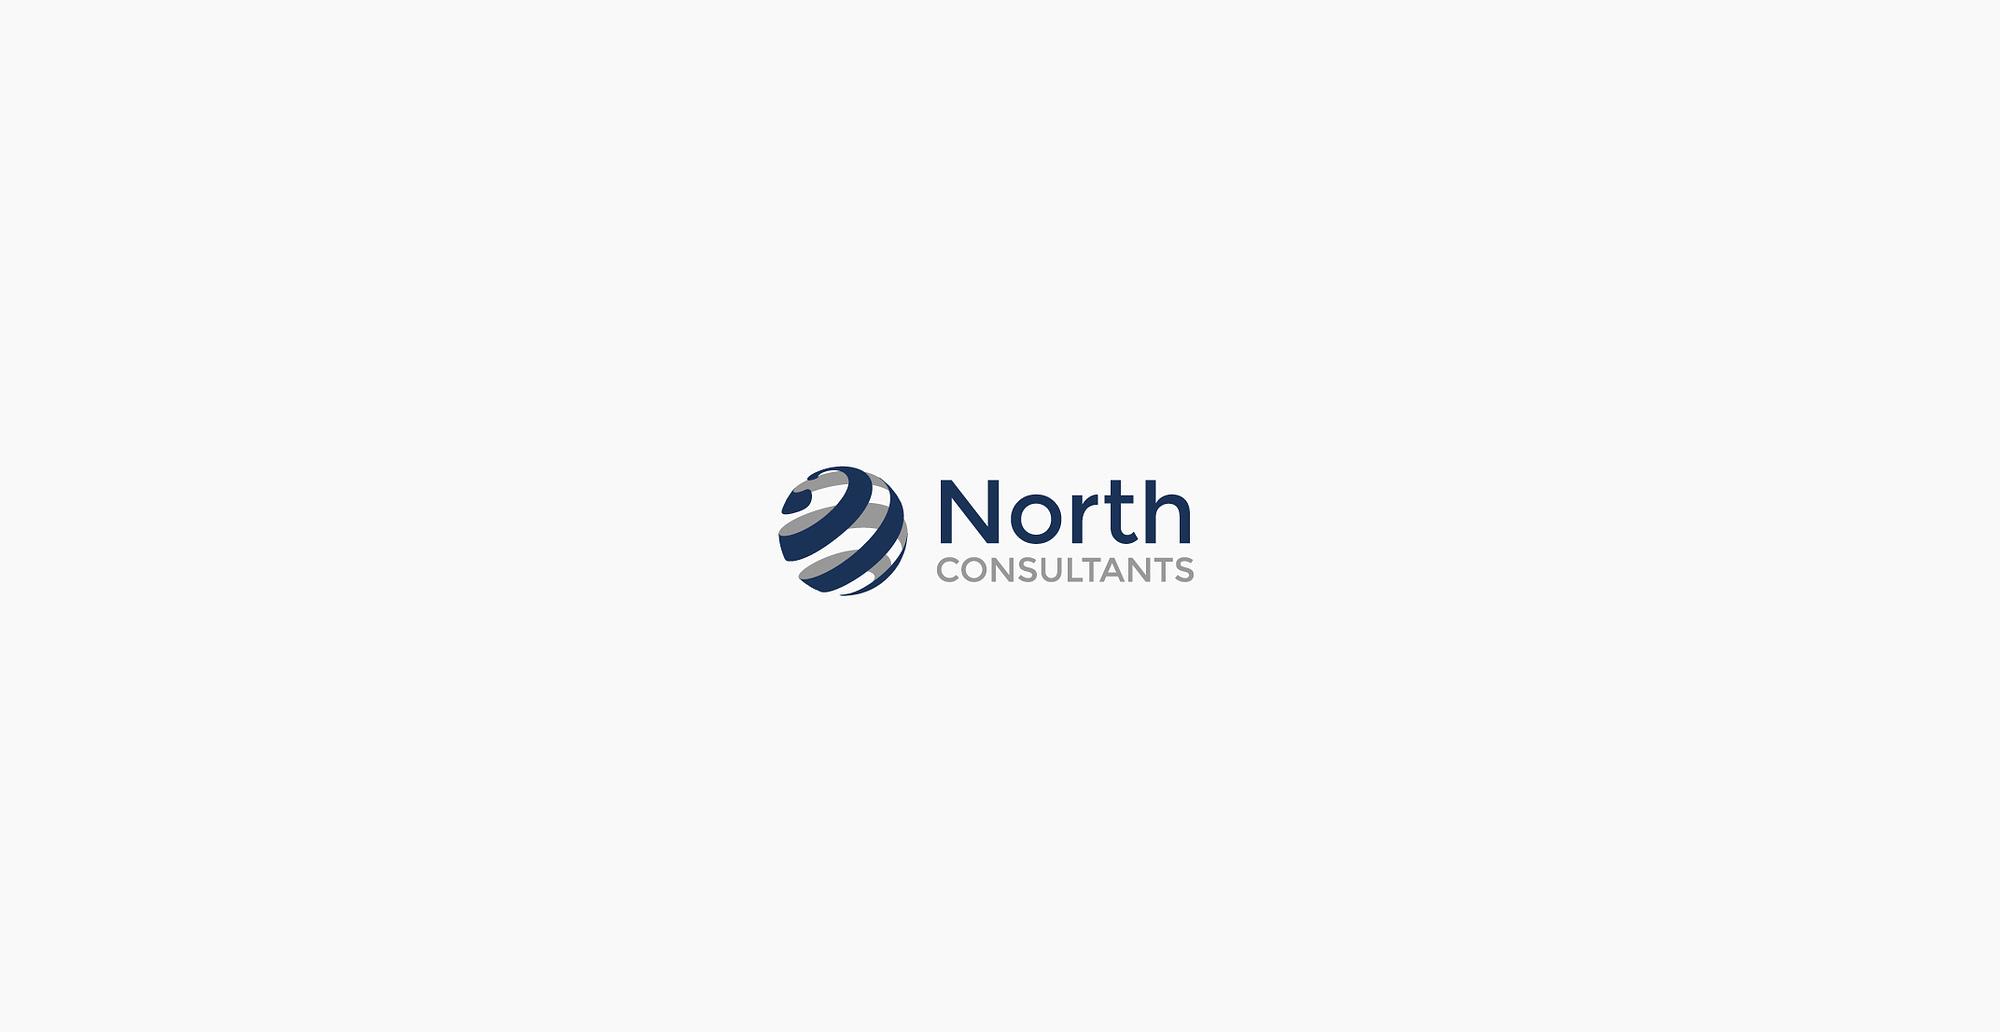 Logo designe for North Consultants